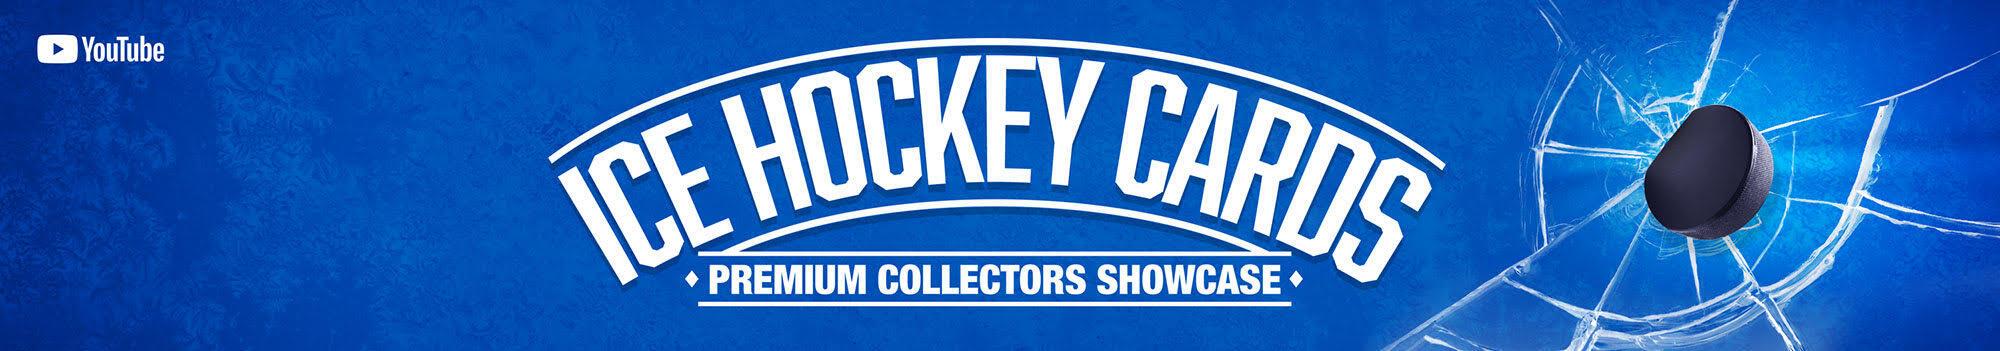 IceHockeyCards.com